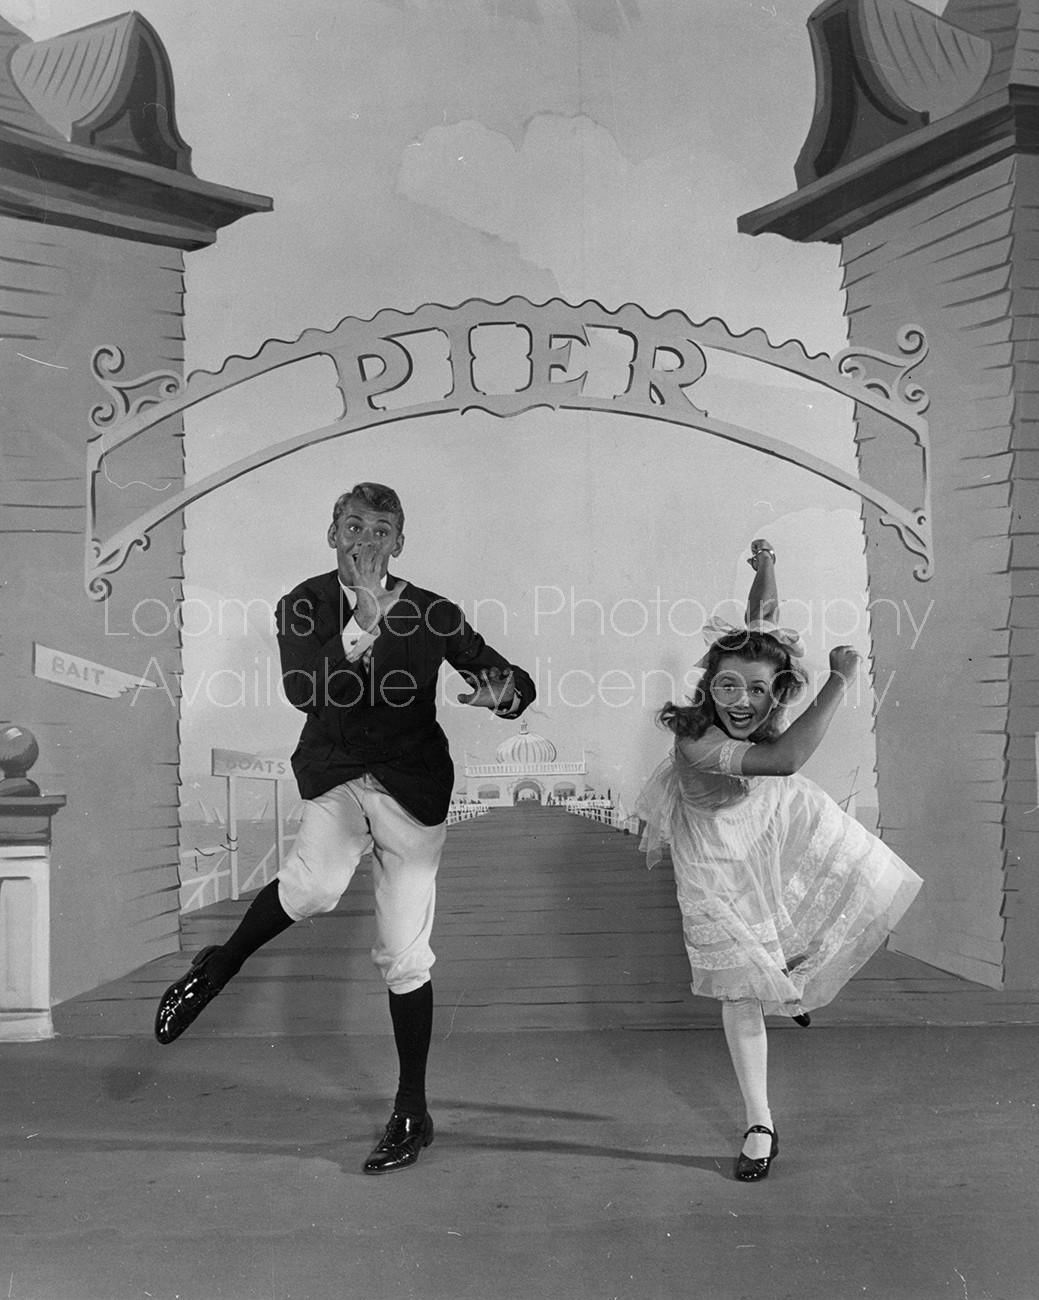 DEBBIE REYNOLDS DANCING